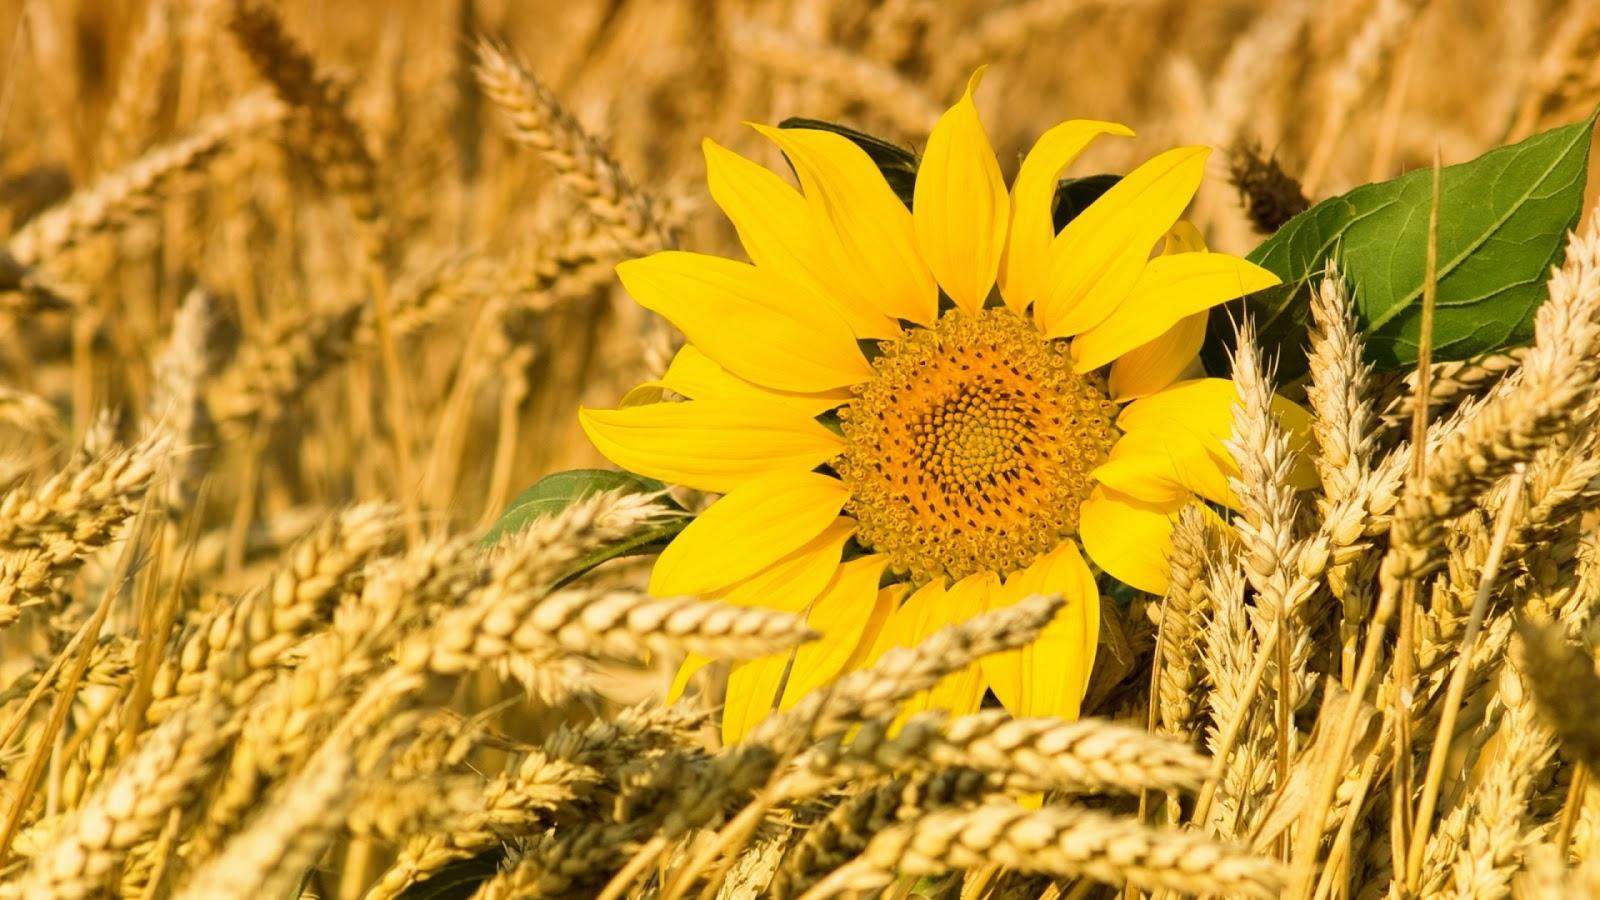 Sunflowers Wheatfield